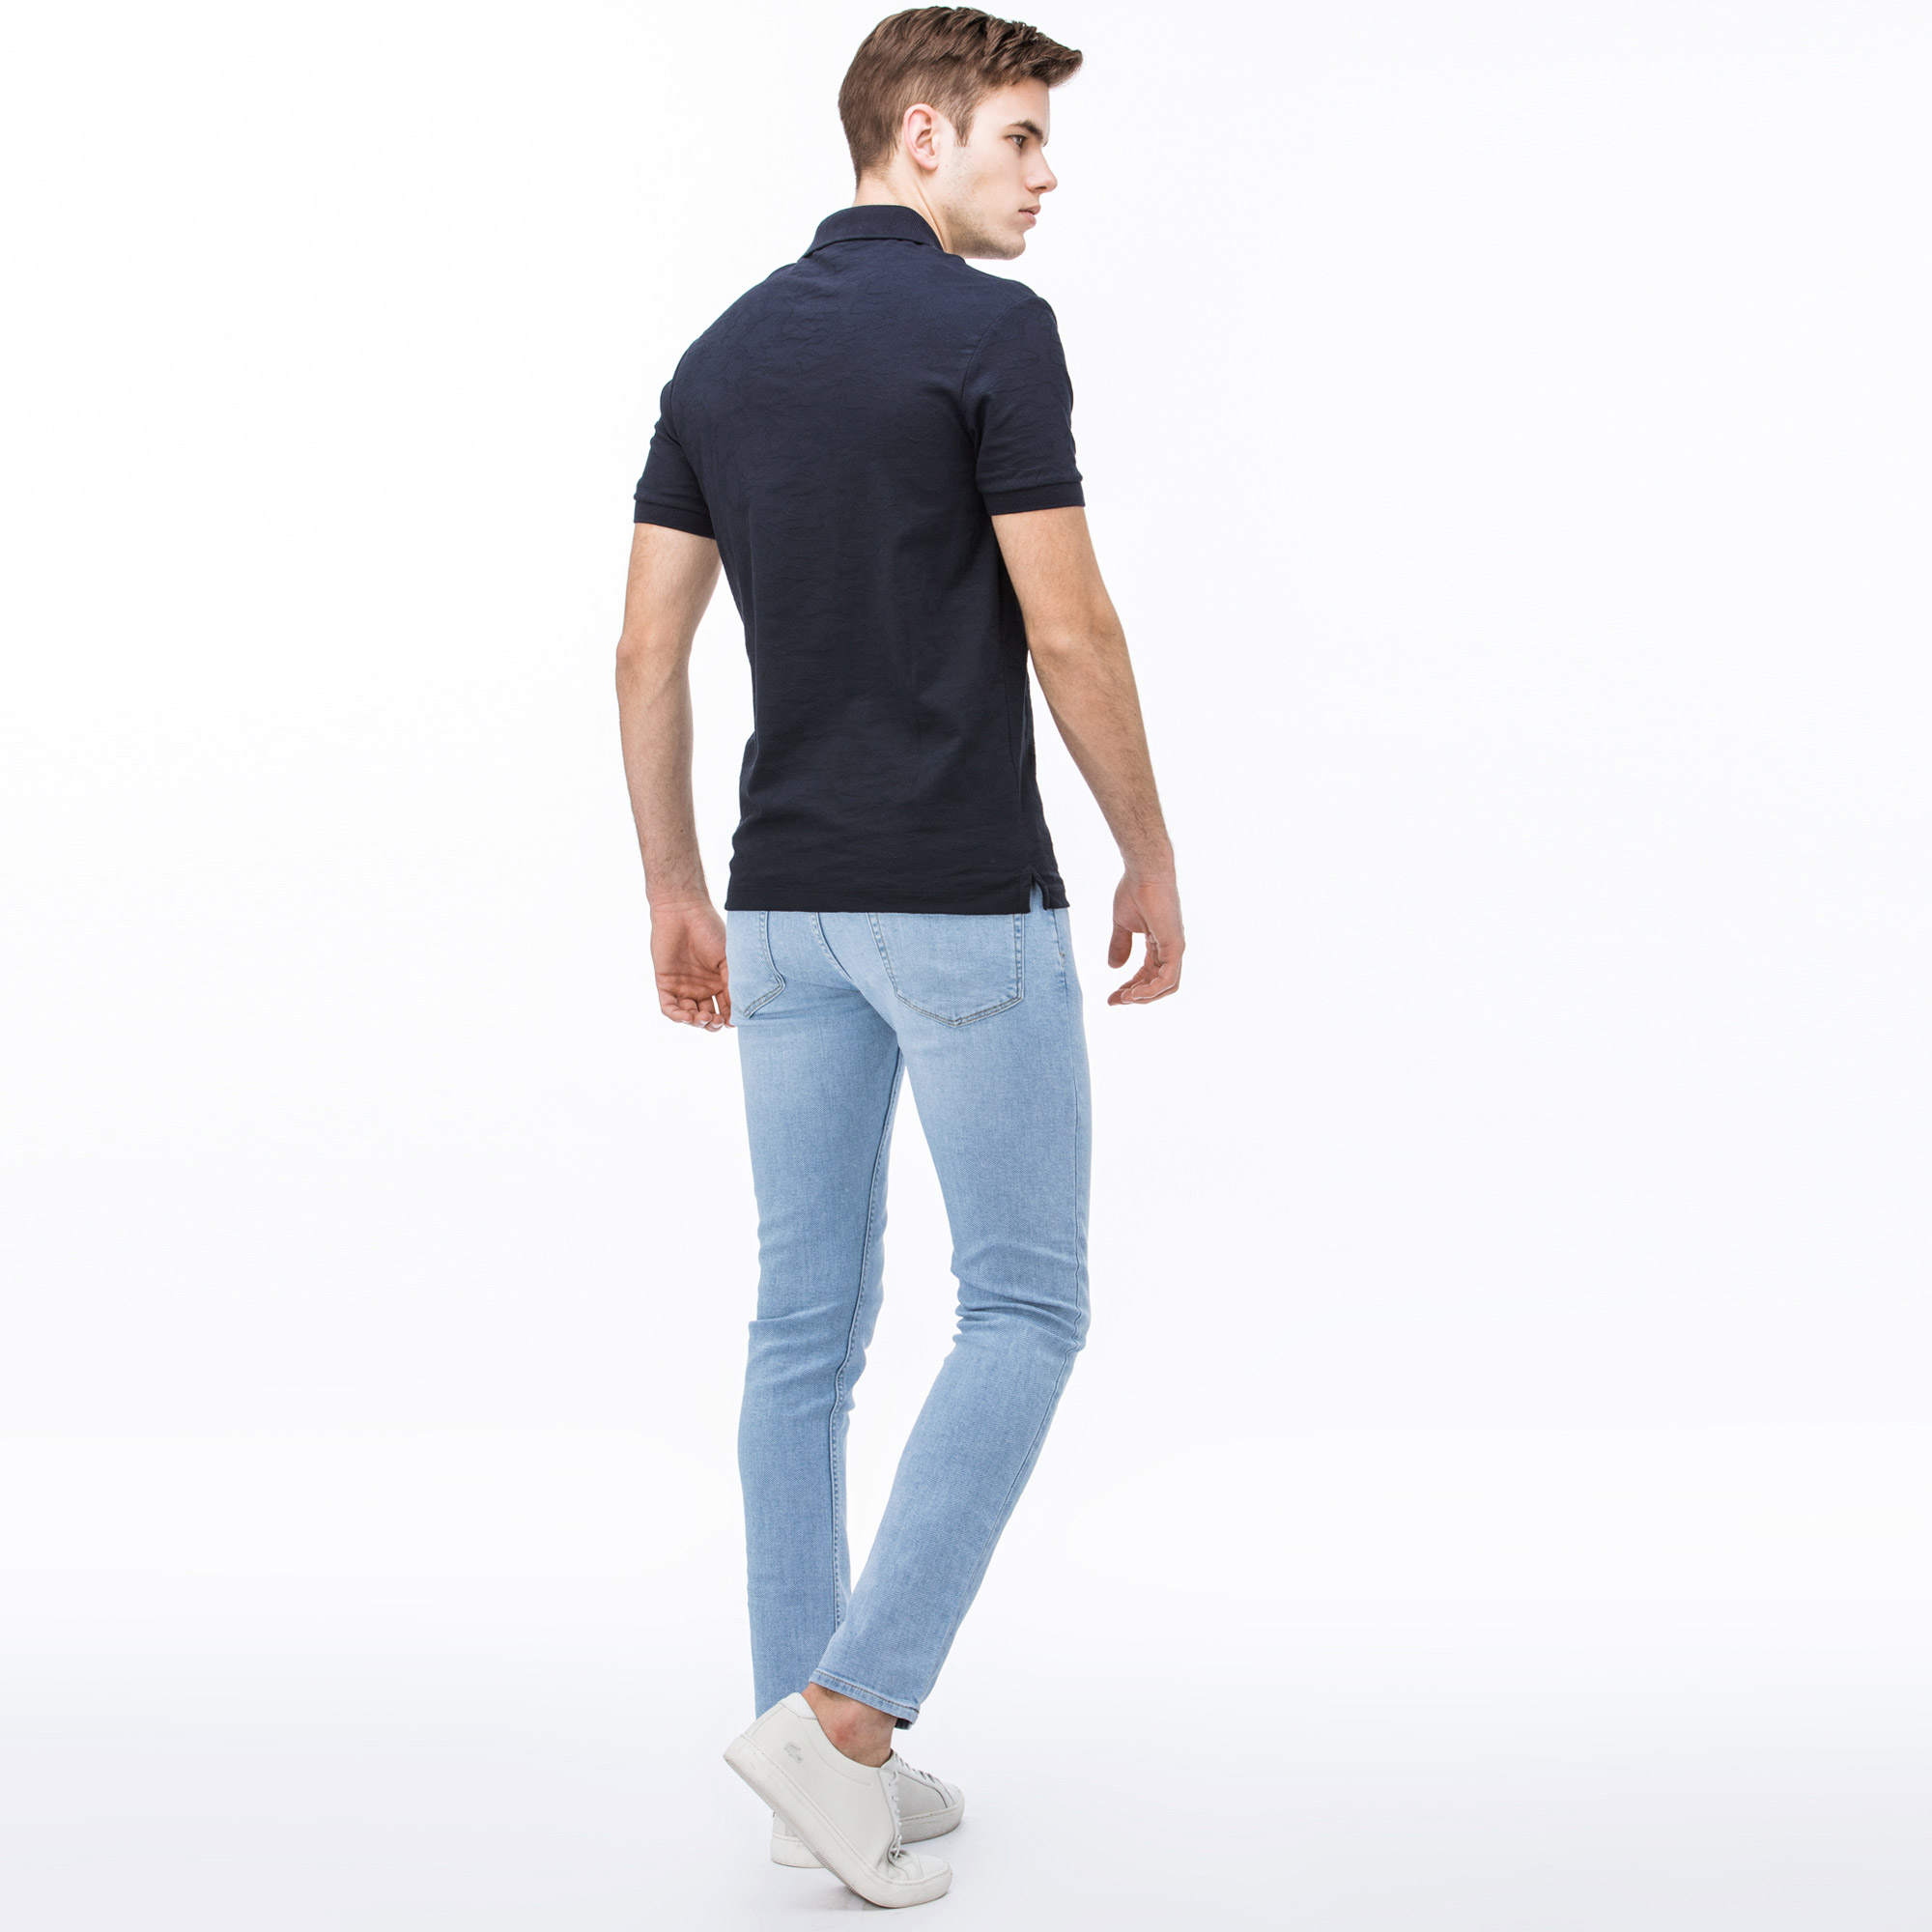 Lacoste Spodnie Męskie Slim Fit0